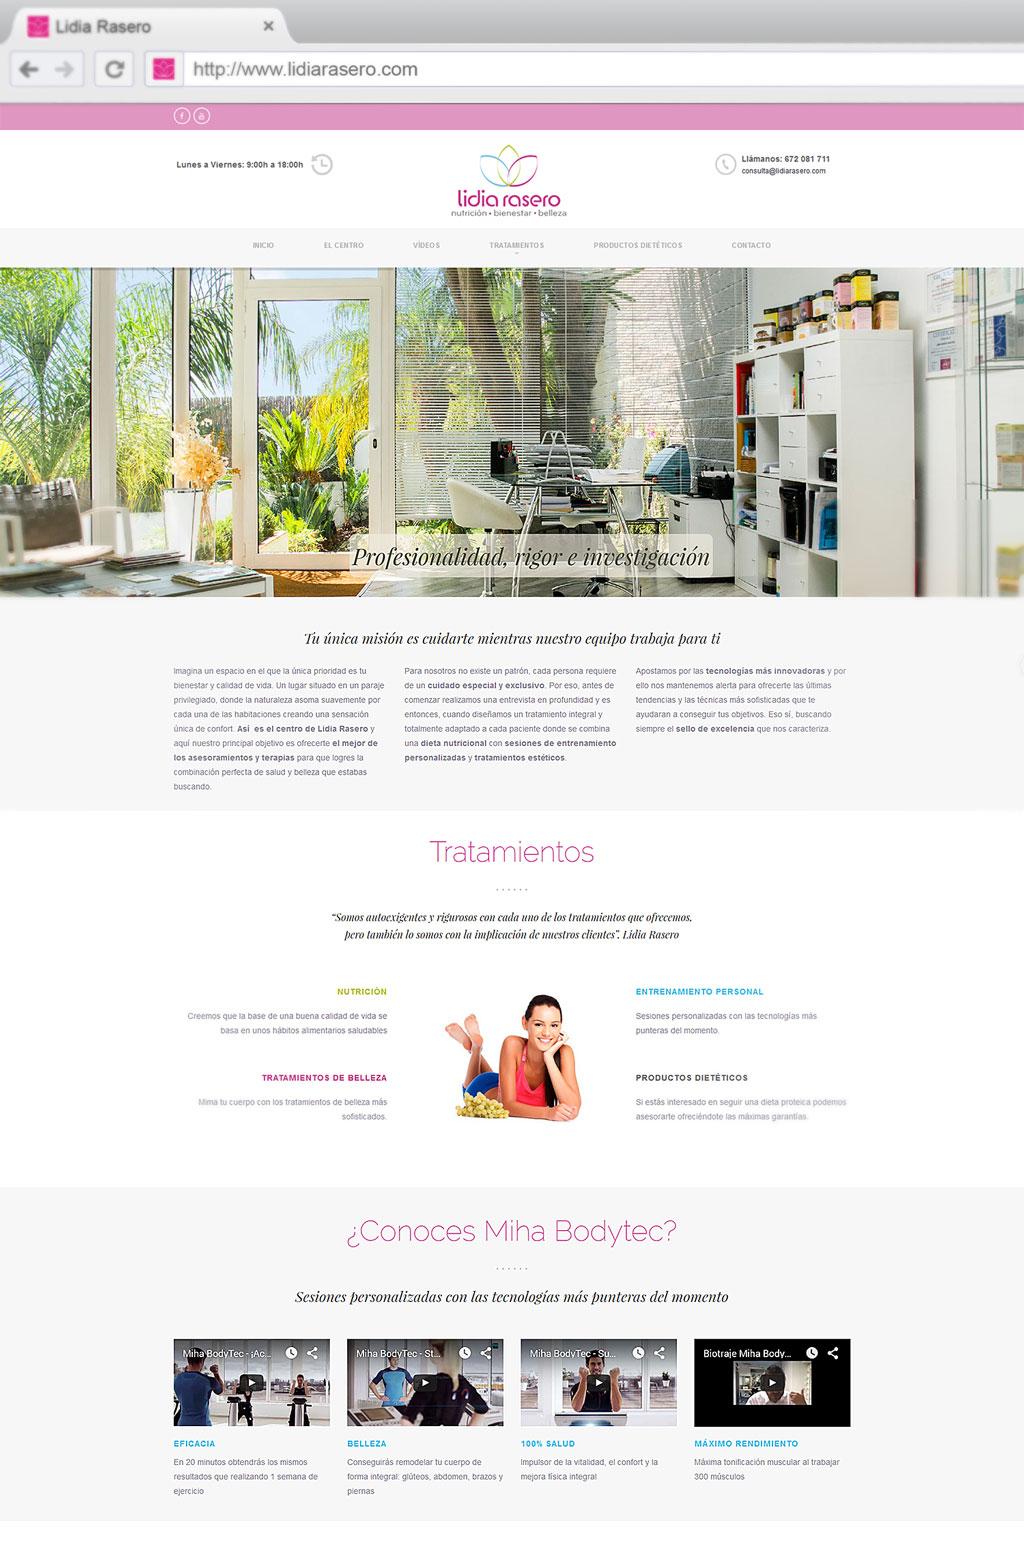 graphe-disseny-web-lidia-rasero